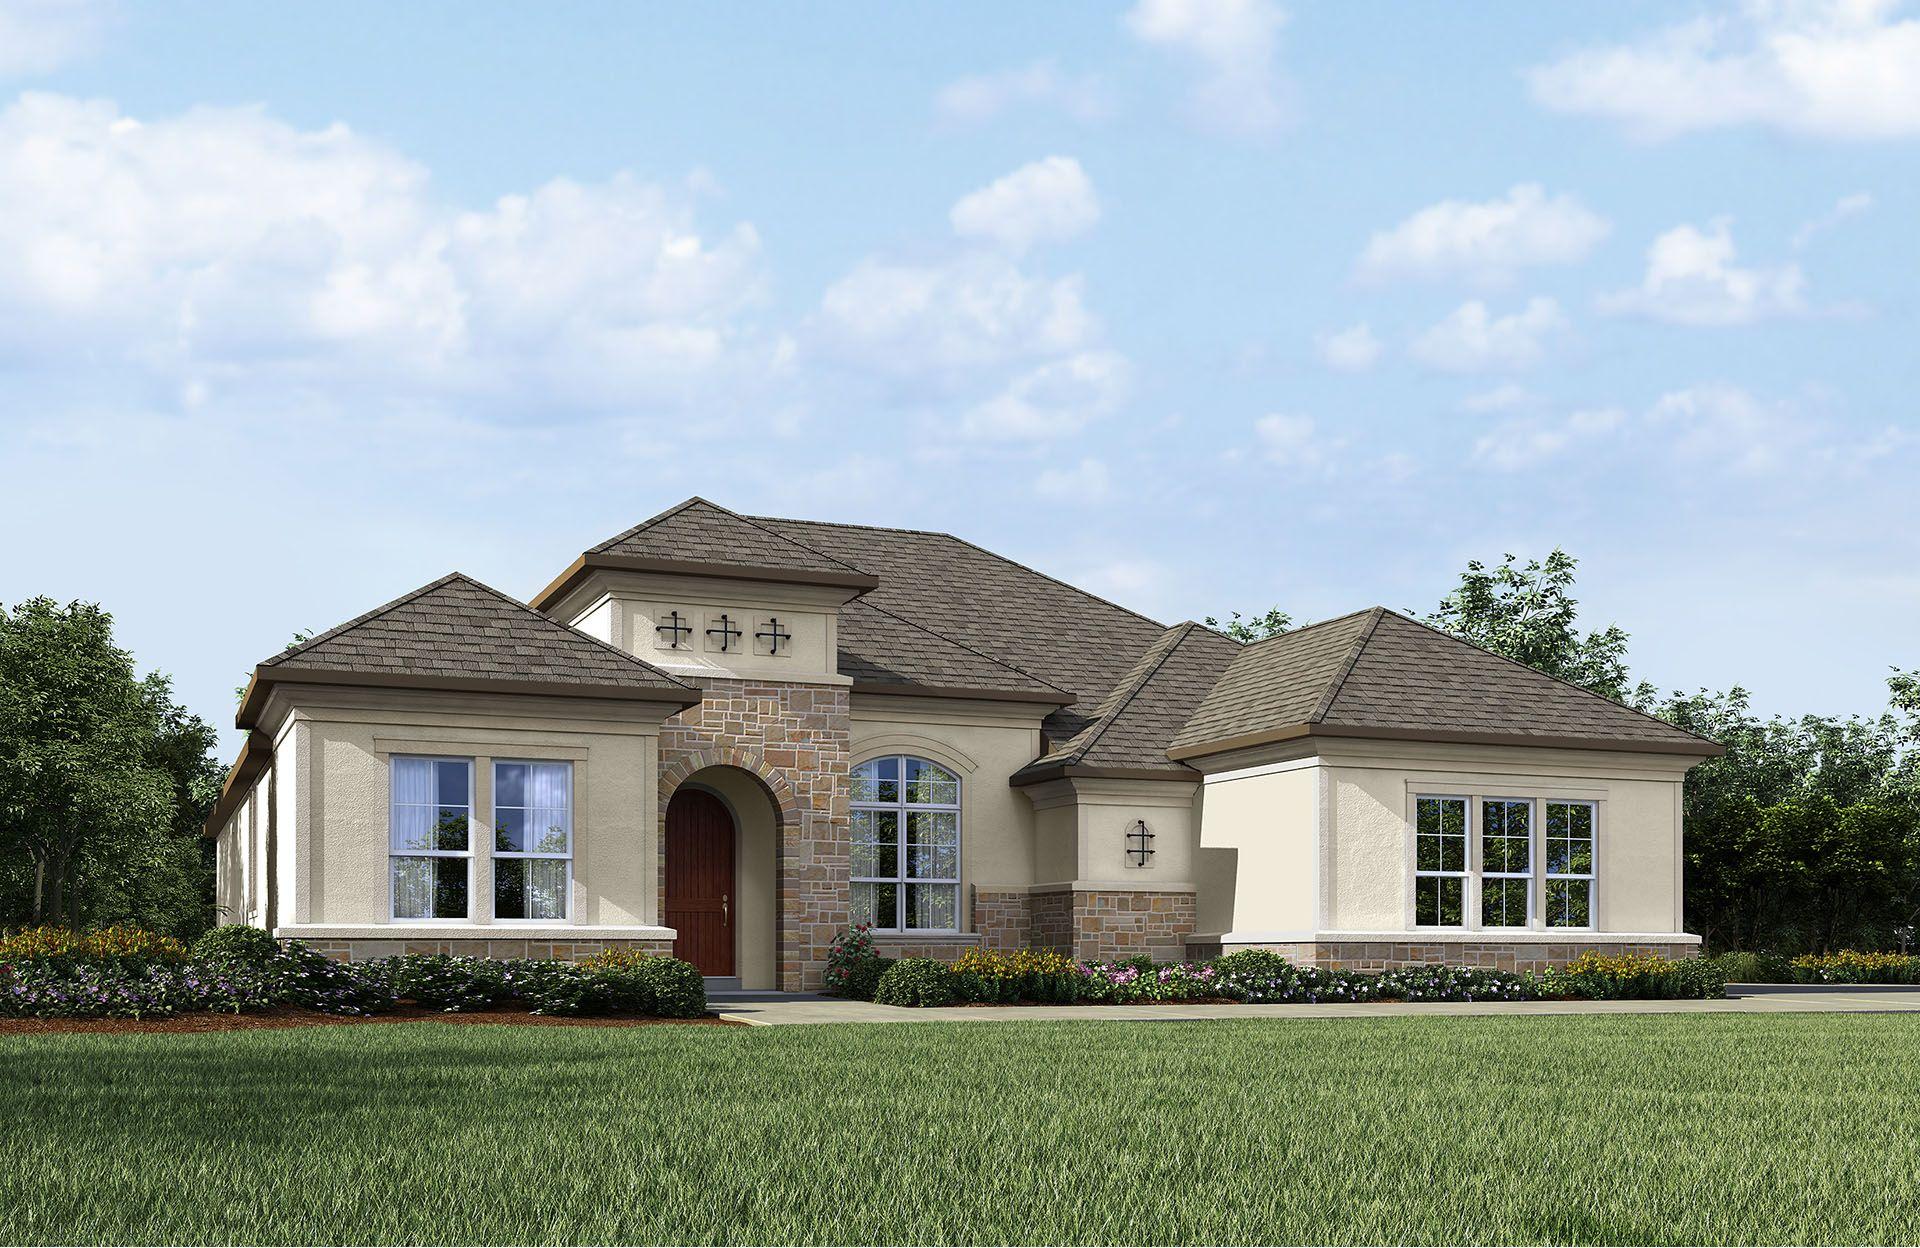 Single Family for Sale at Cimarron Hills - Lauren Iii 307 Flint Ridge Trail Georgetown, Texas 78628 United States